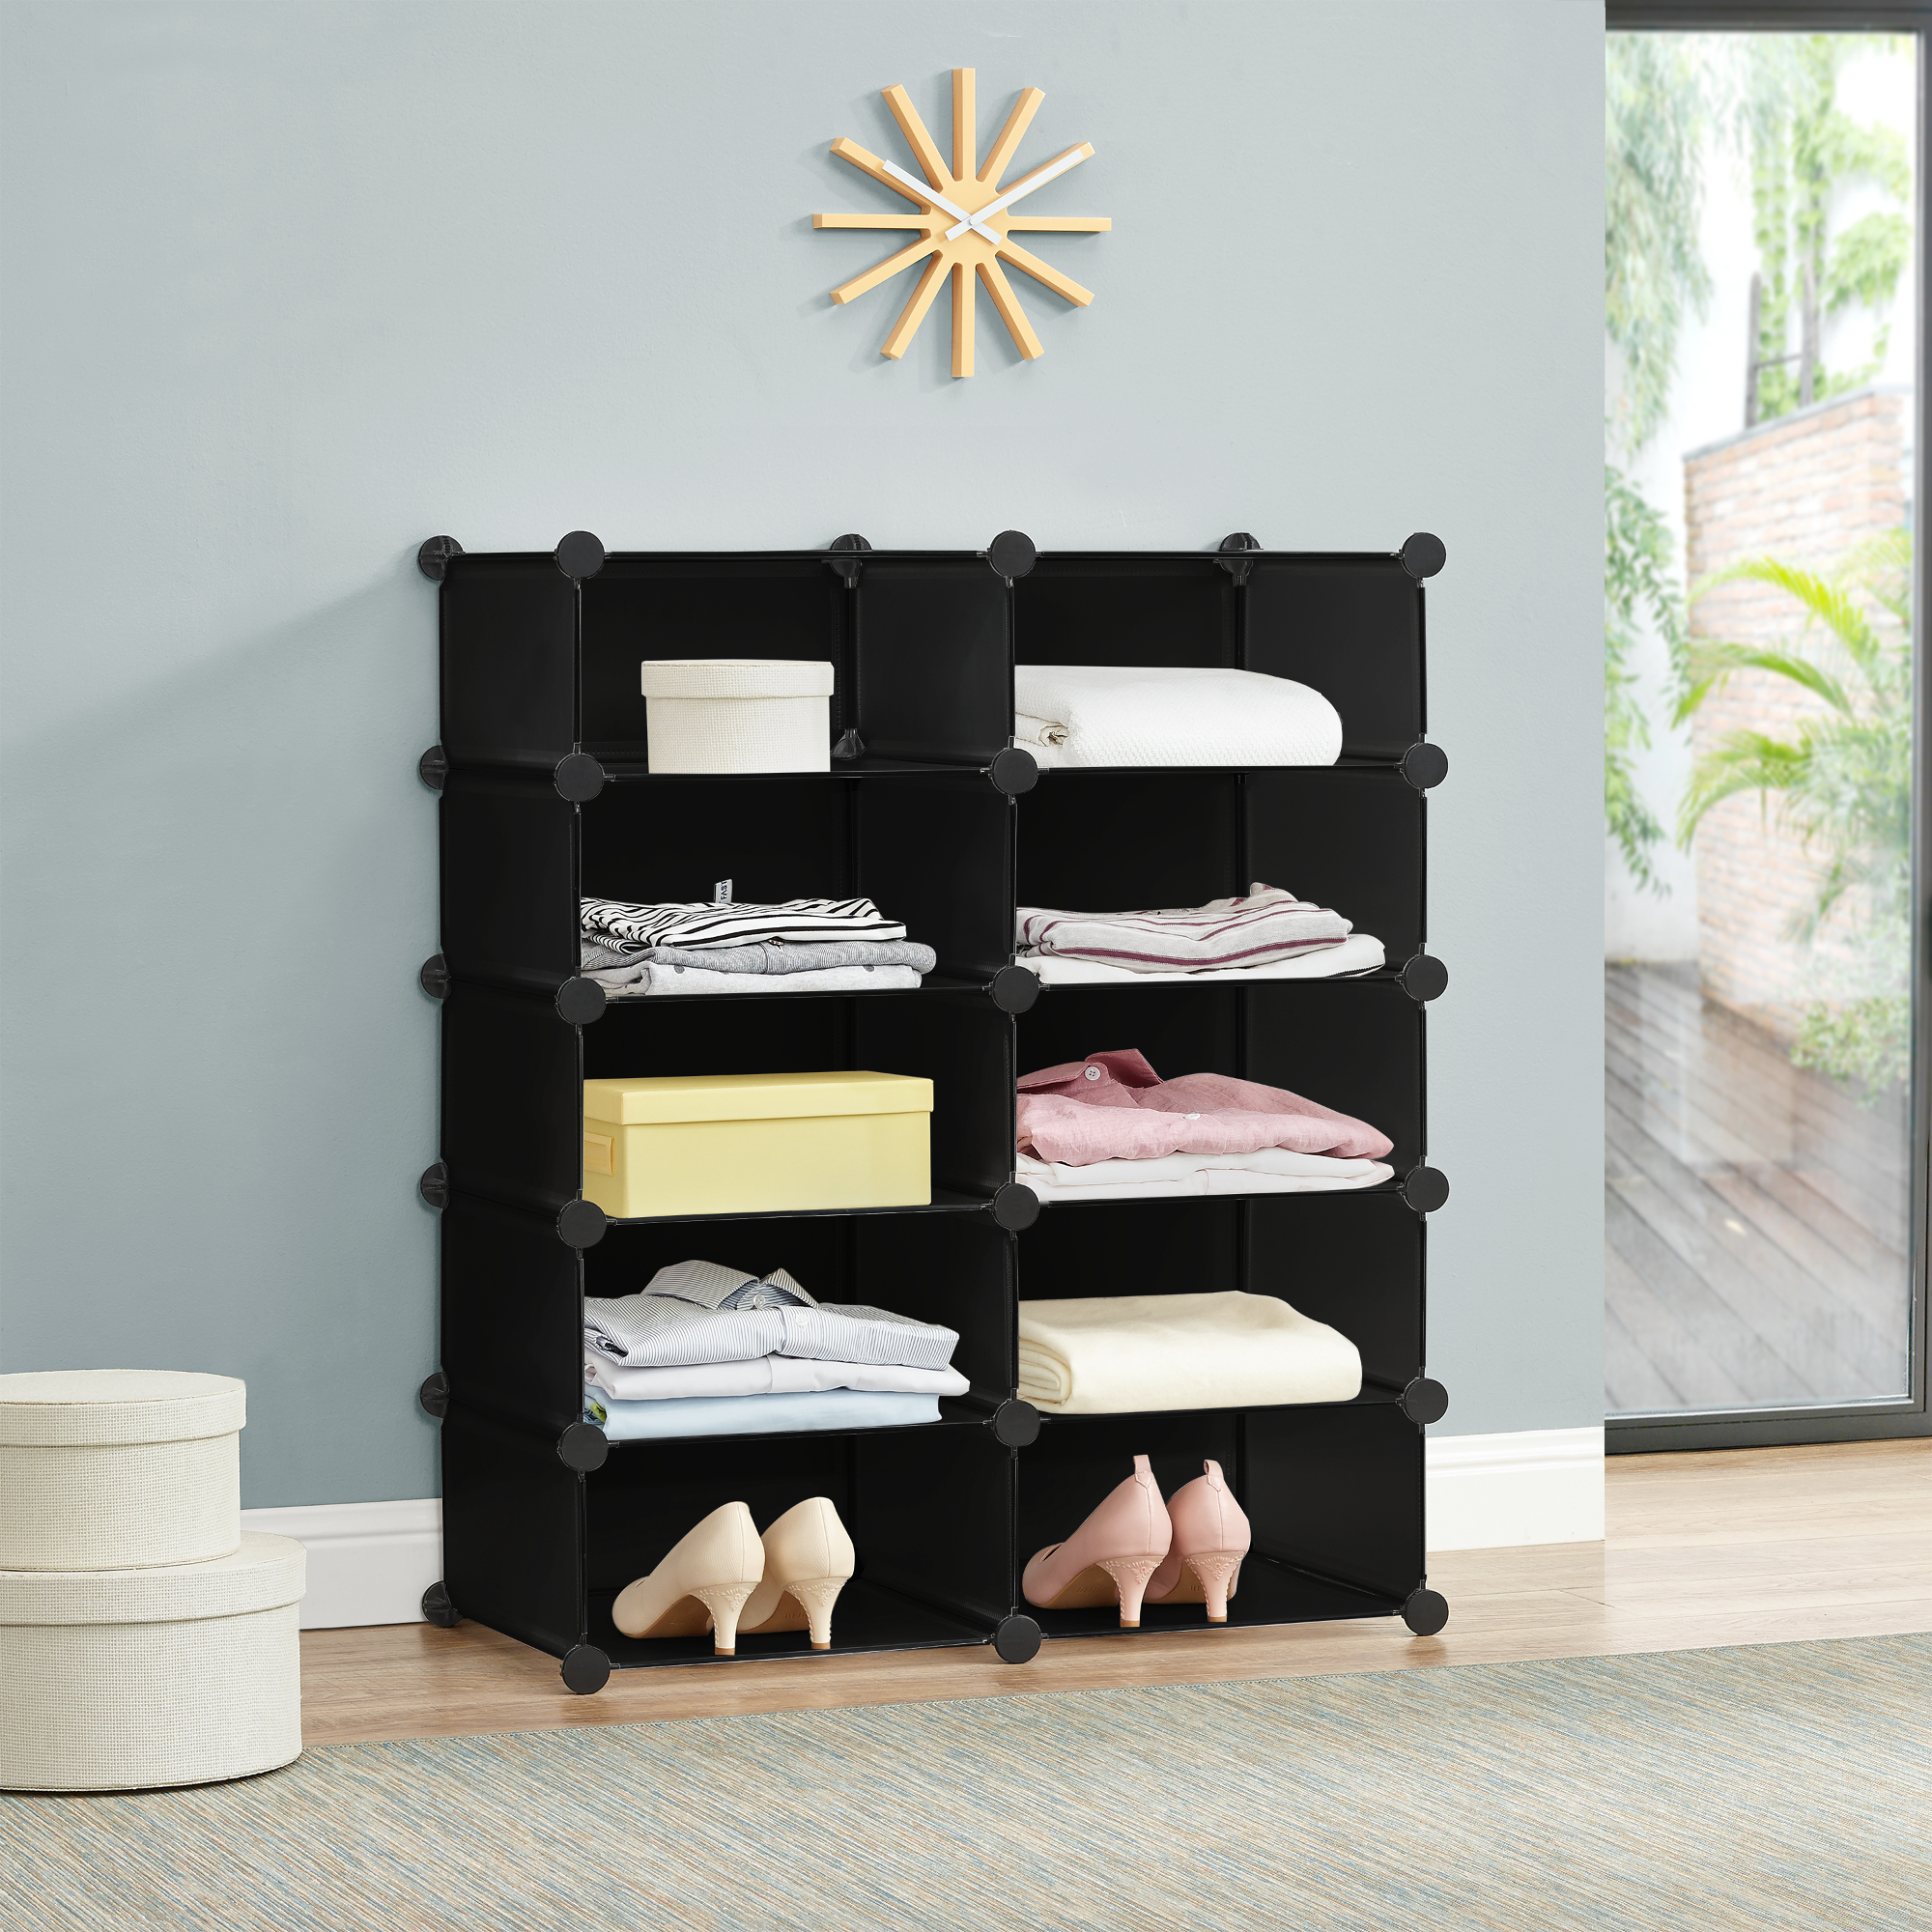 system regal schrank 90x73cm garderobe steck. Black Bedroom Furniture Sets. Home Design Ideas